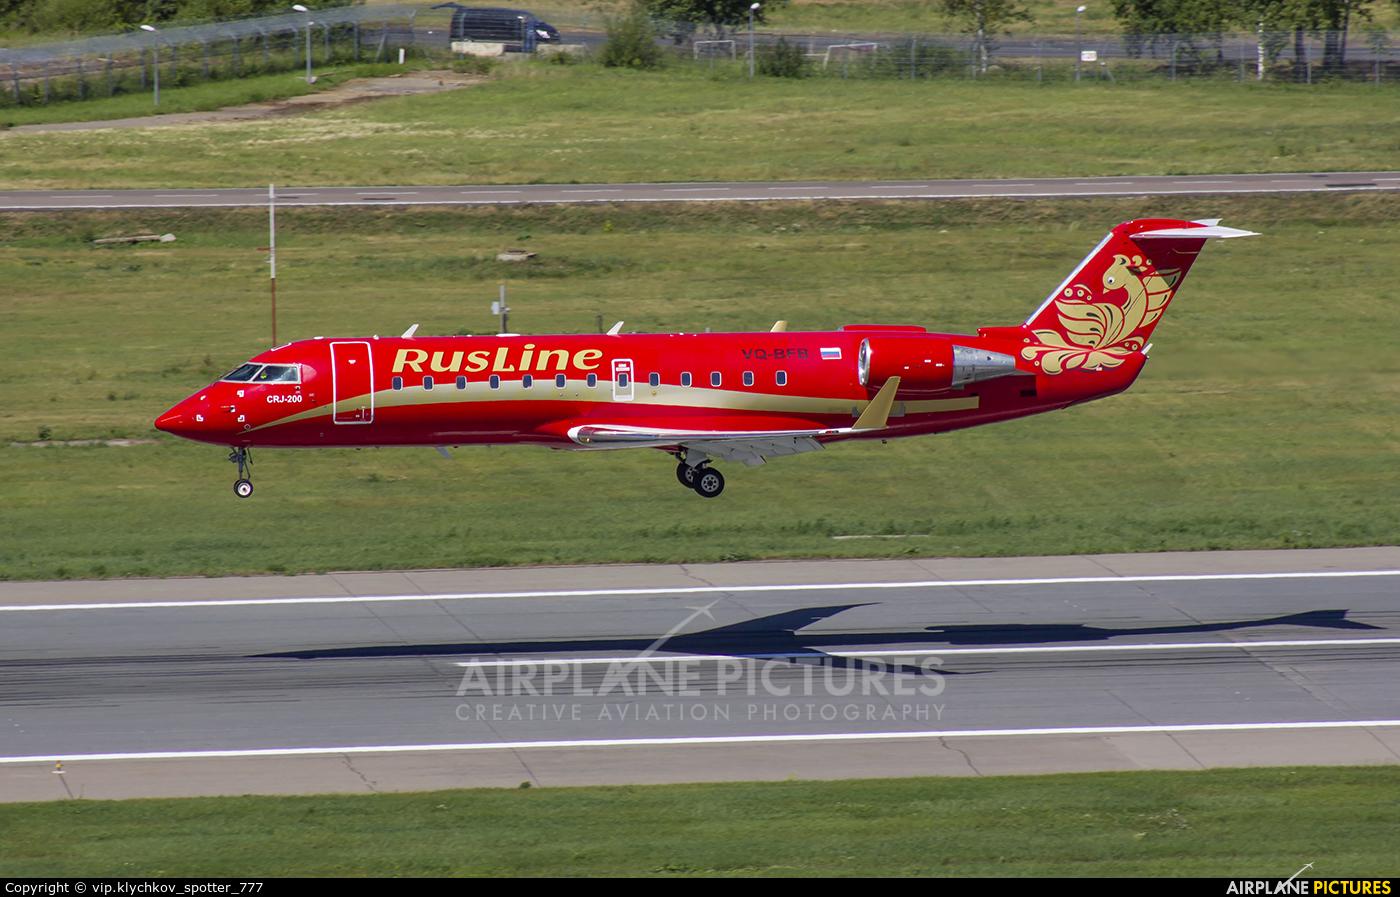 Rusline VQ-BFB aircraft at Moscow - Vnukovo